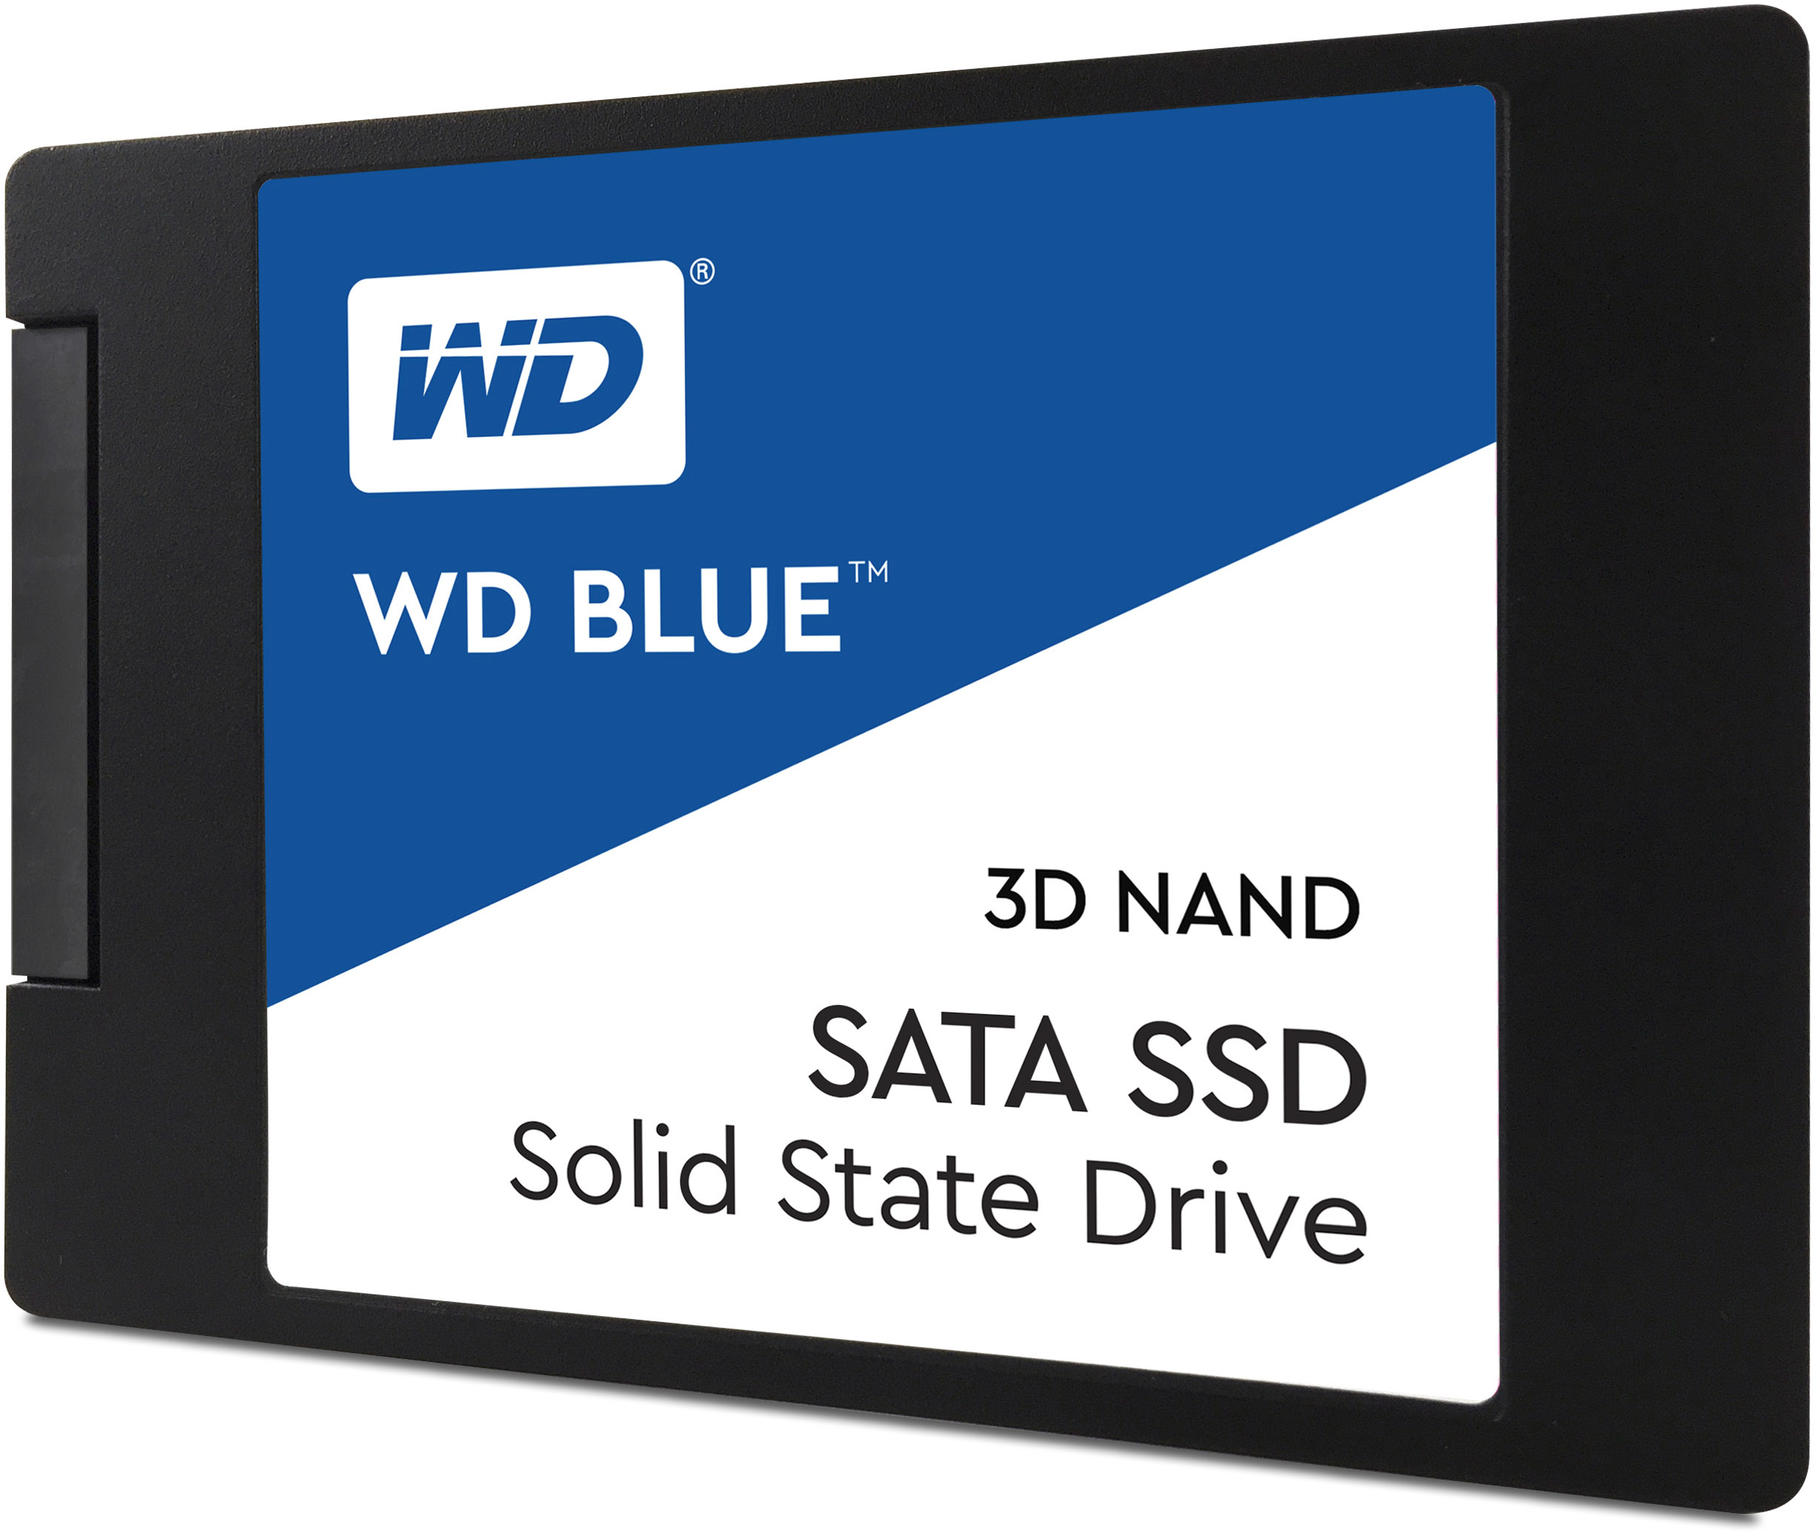 WD Blue 3D Nand 500GB